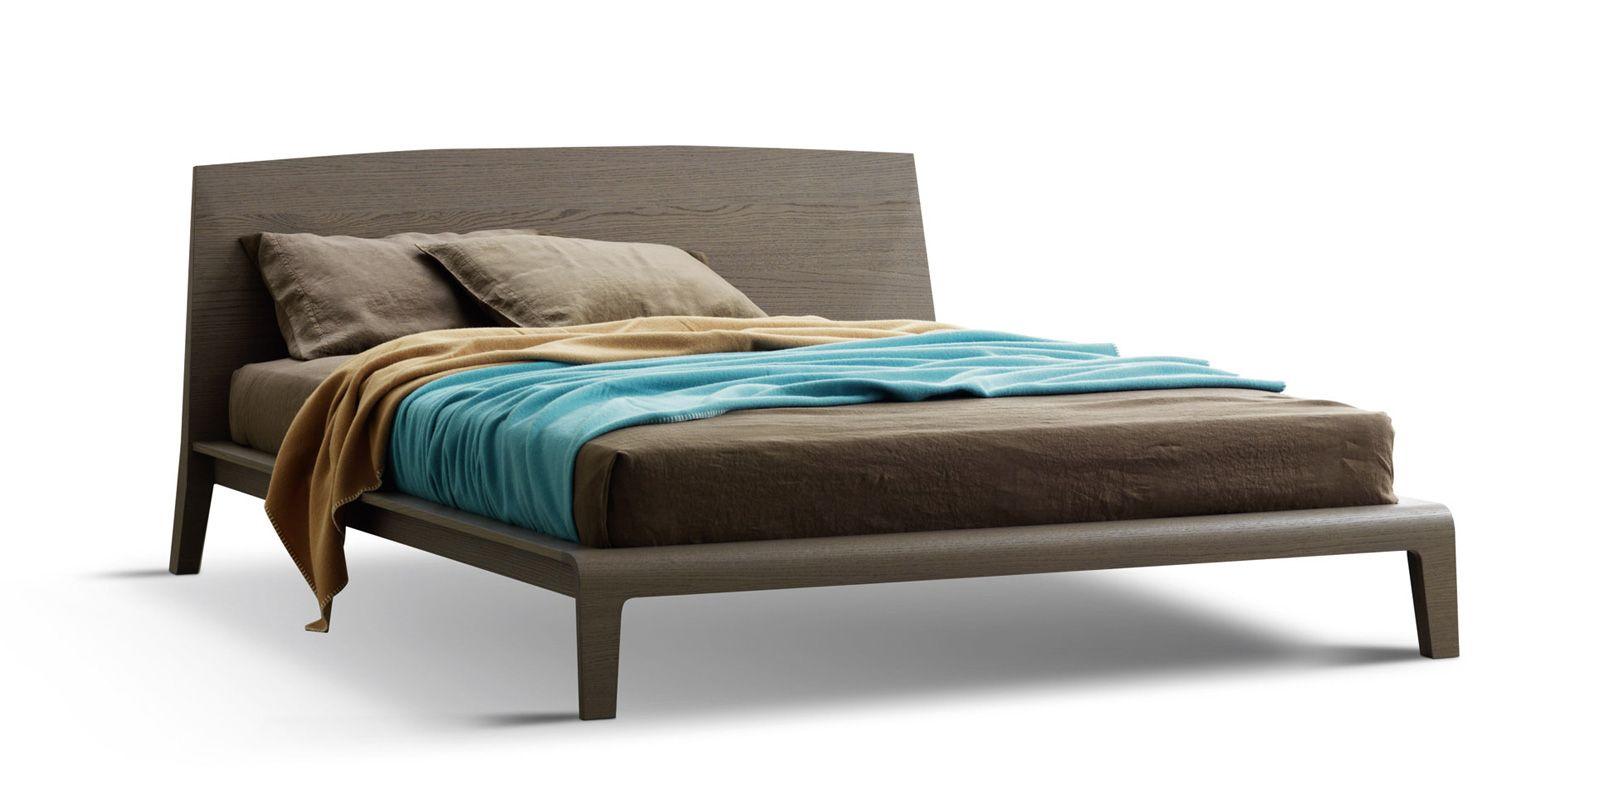 Camere da letto Mobilificio San Giacomo,letto Cloe #rifarecasa #maistatocosifacile grazie a #designbox & #designcard #idfsrl